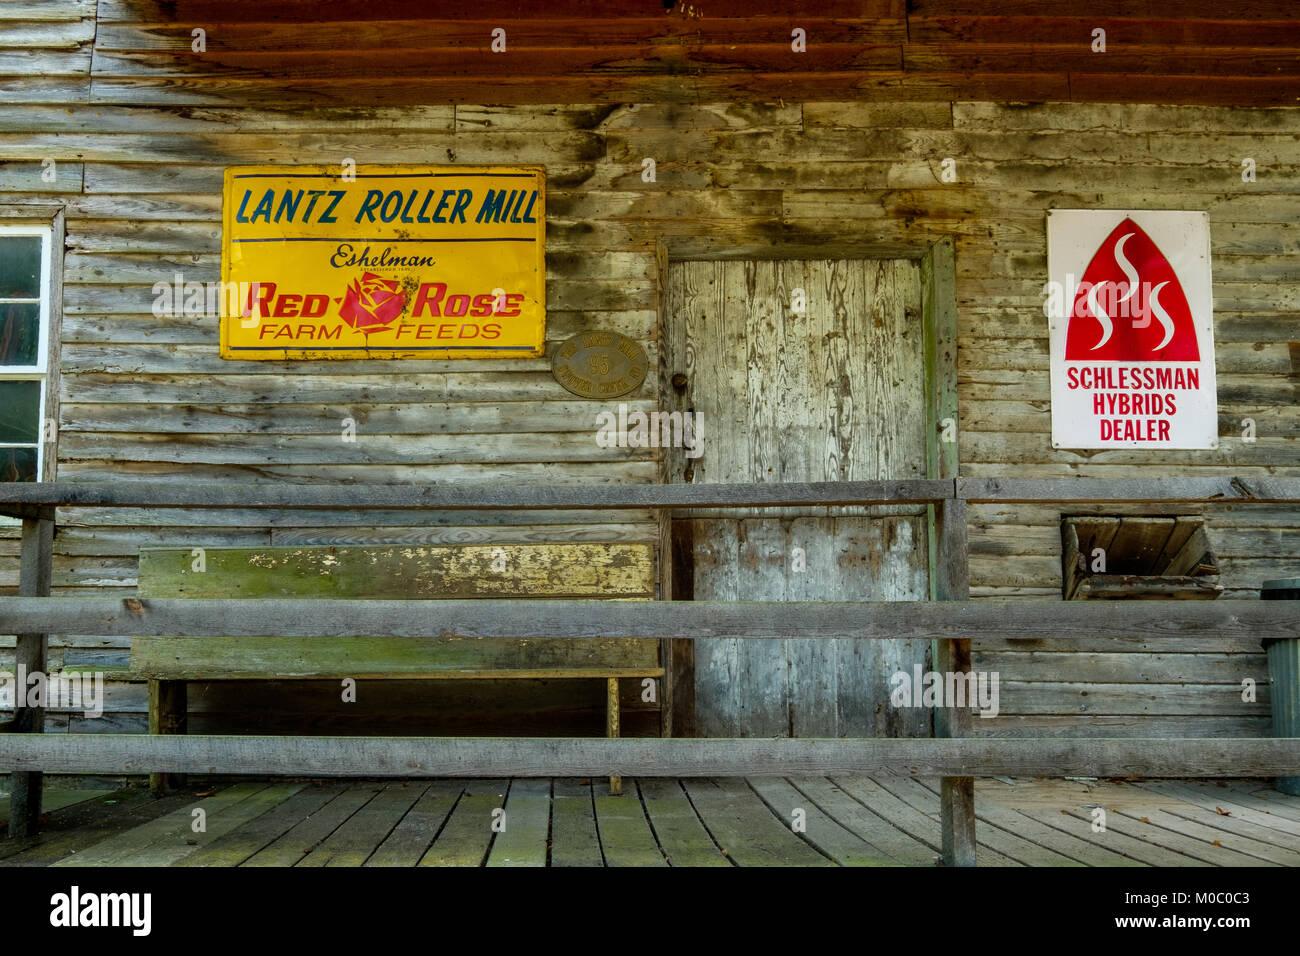 Lantz Mill, 95 Swover Creek Road, Edinburg, Virginia - Stock Image